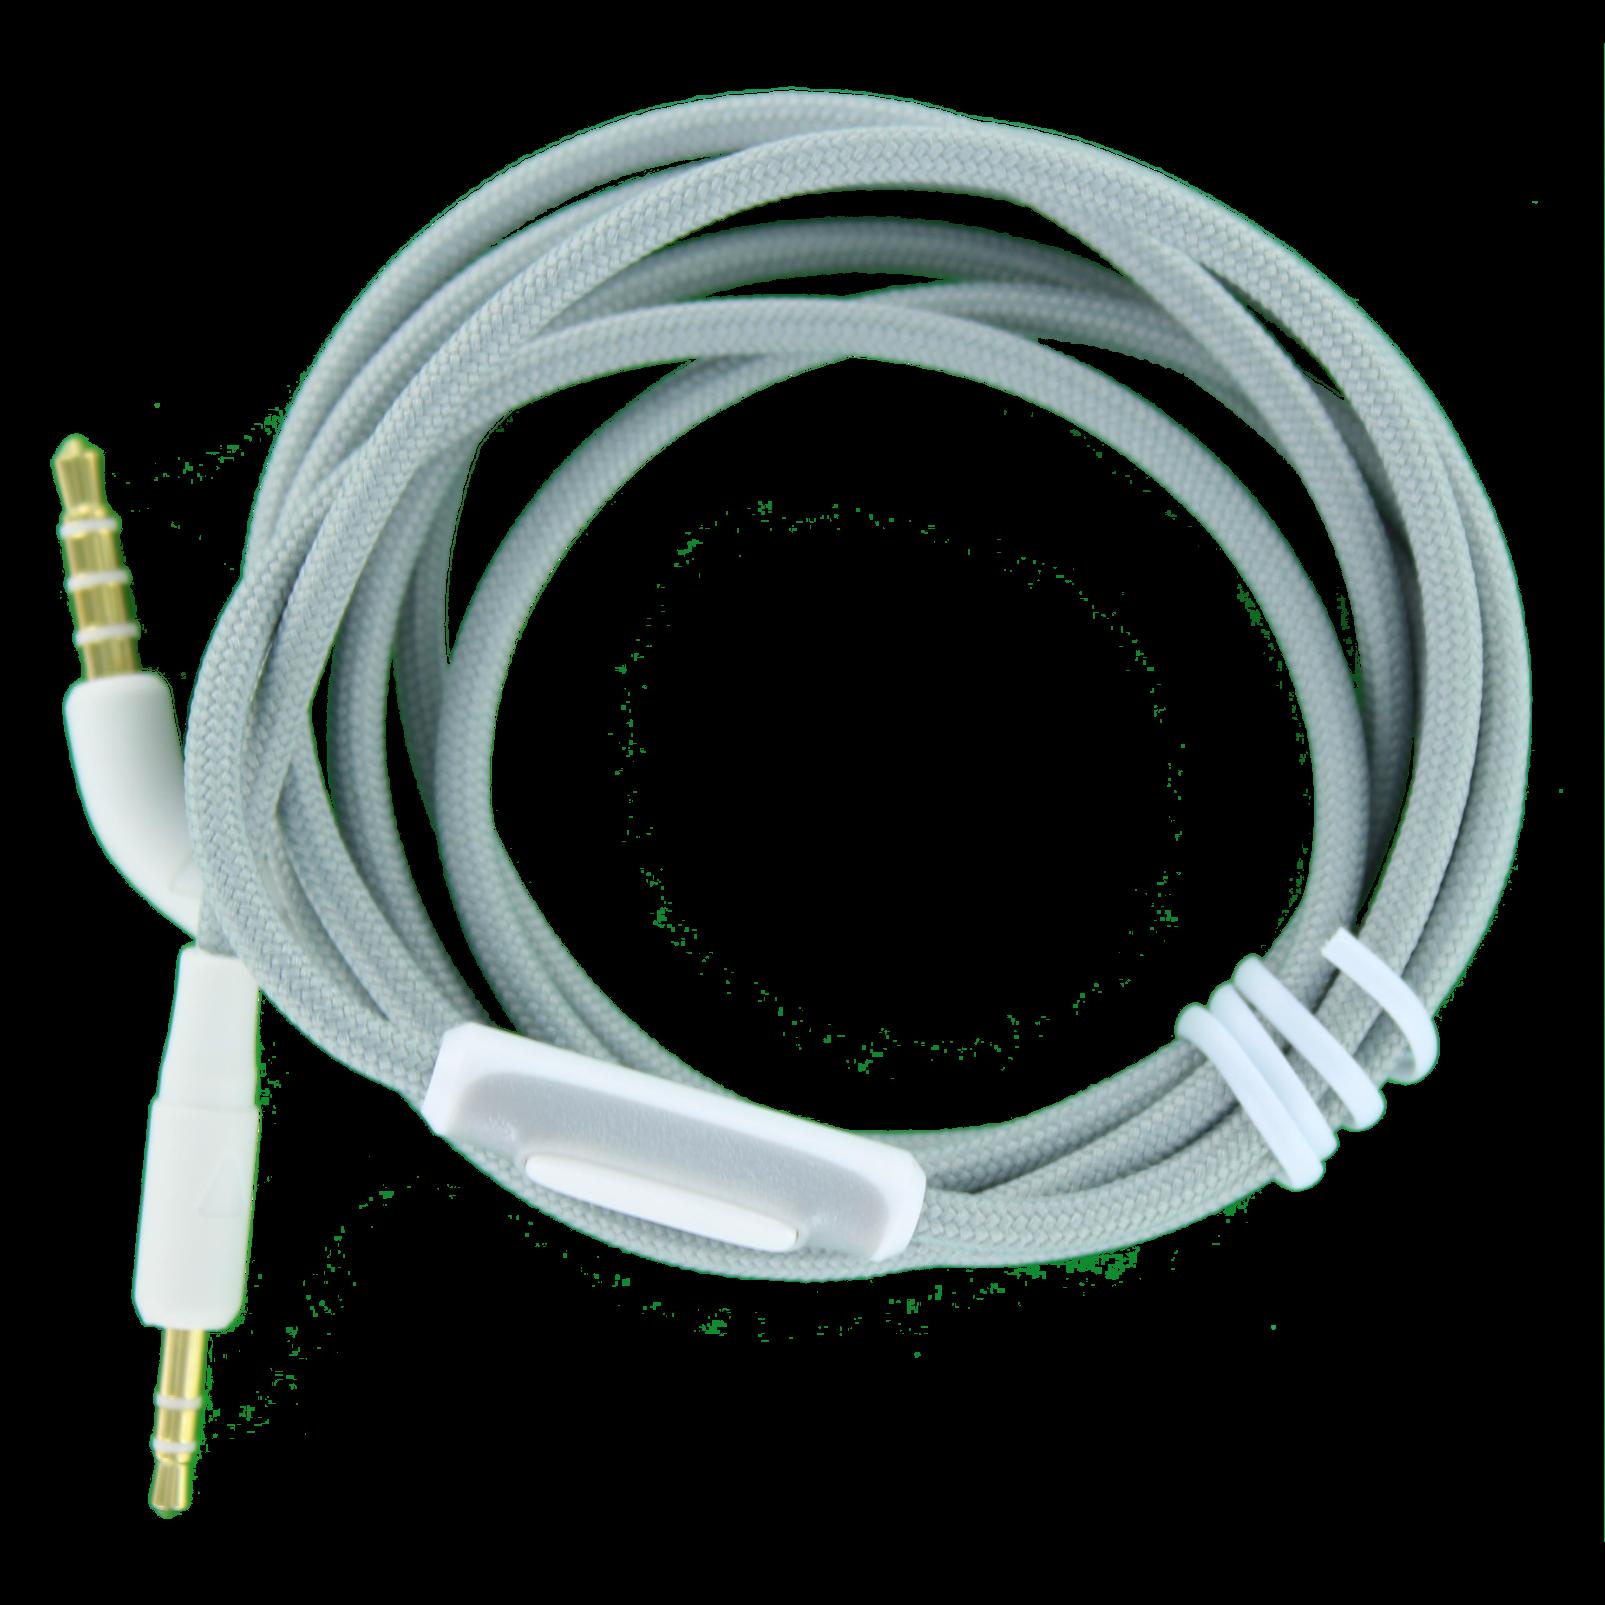 Audio cable E35, E45BT, E55